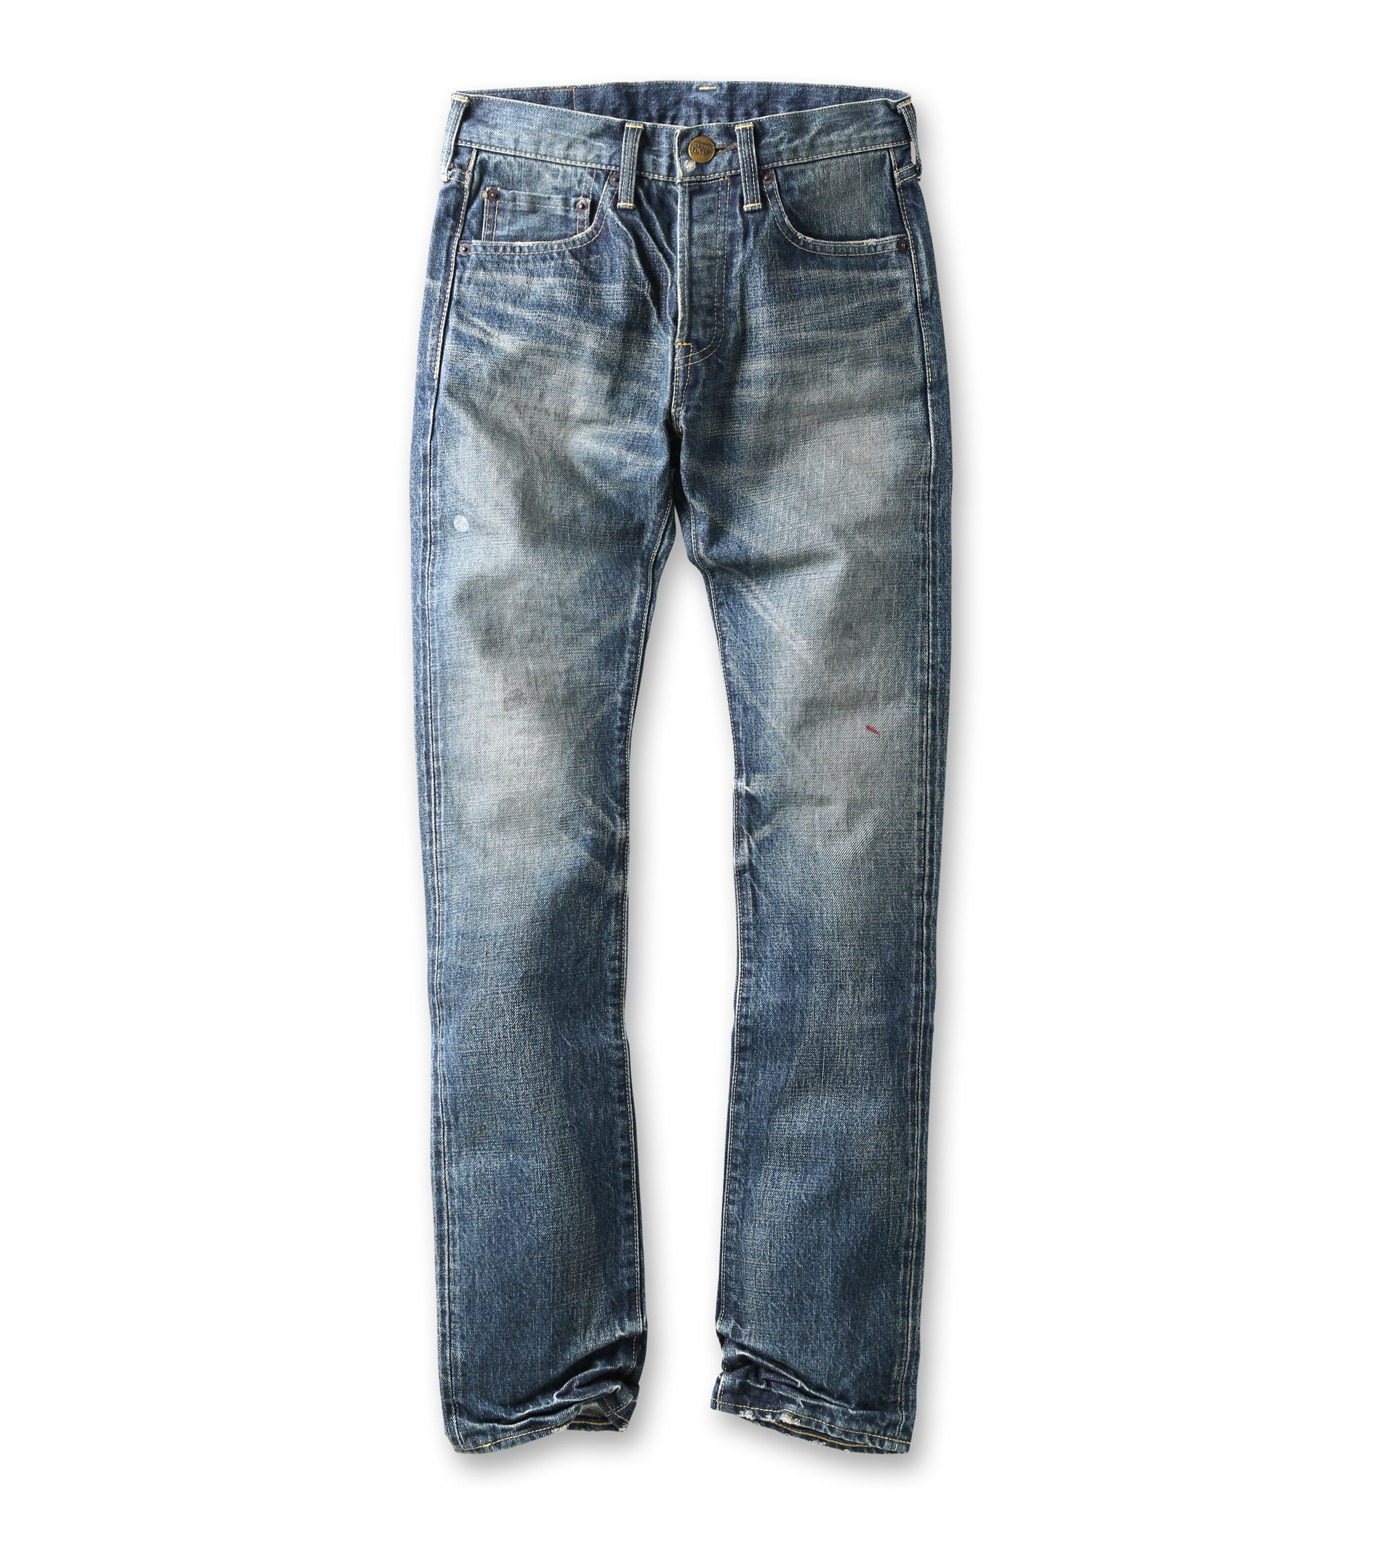 Heddie Lovu(エディー ルーヴ)のASHMidiumBody-BLUE(パンツ/pants)-ASH-MID-13A-92 拡大詳細画像1